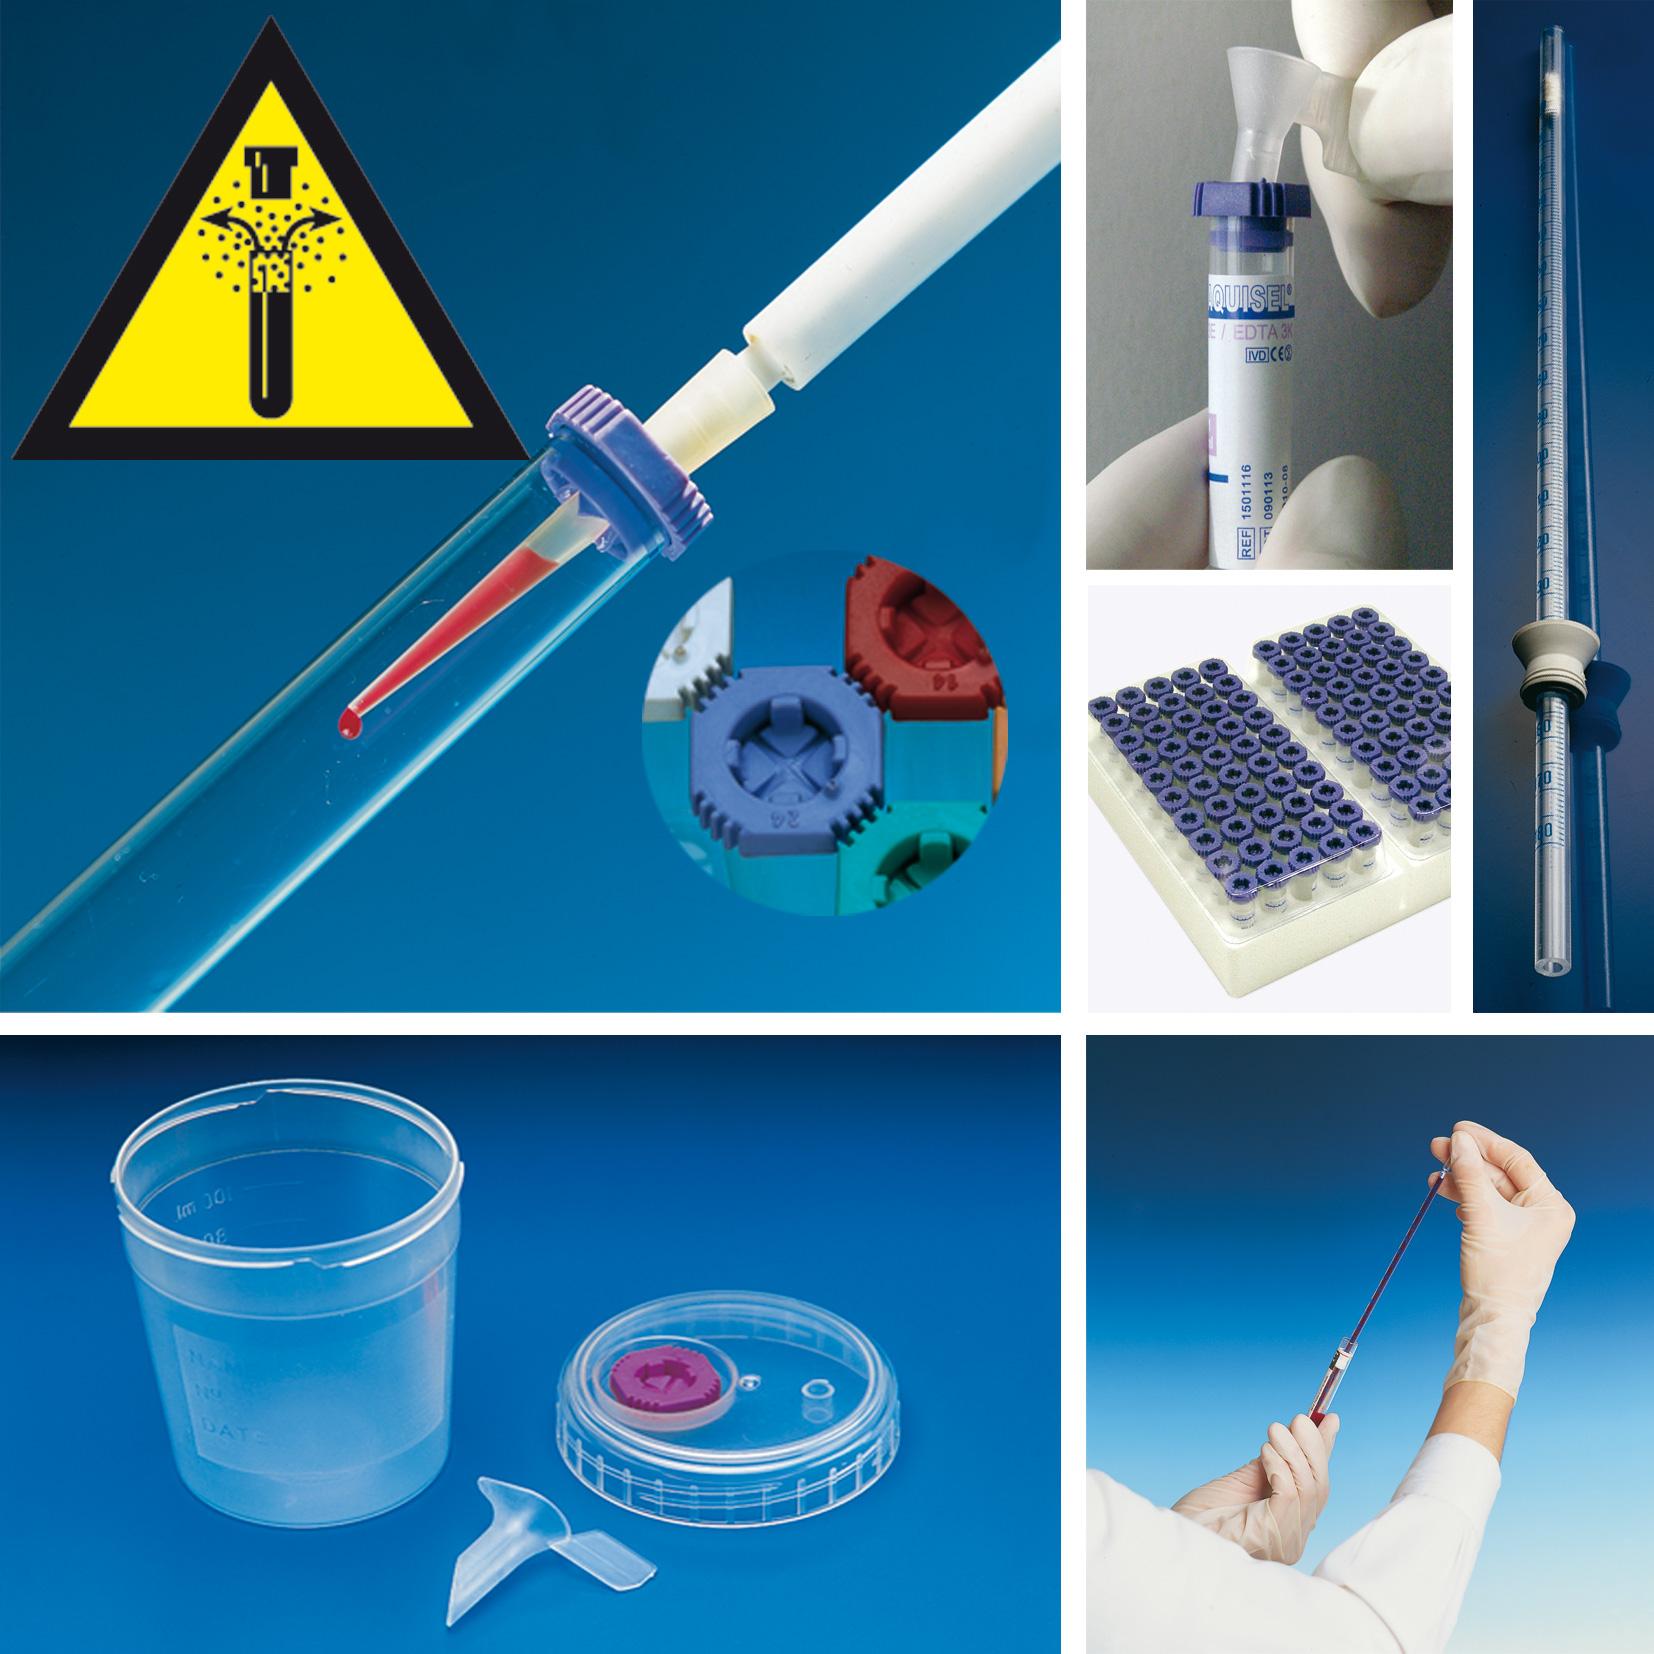 Aquisel, single-use IVD products.